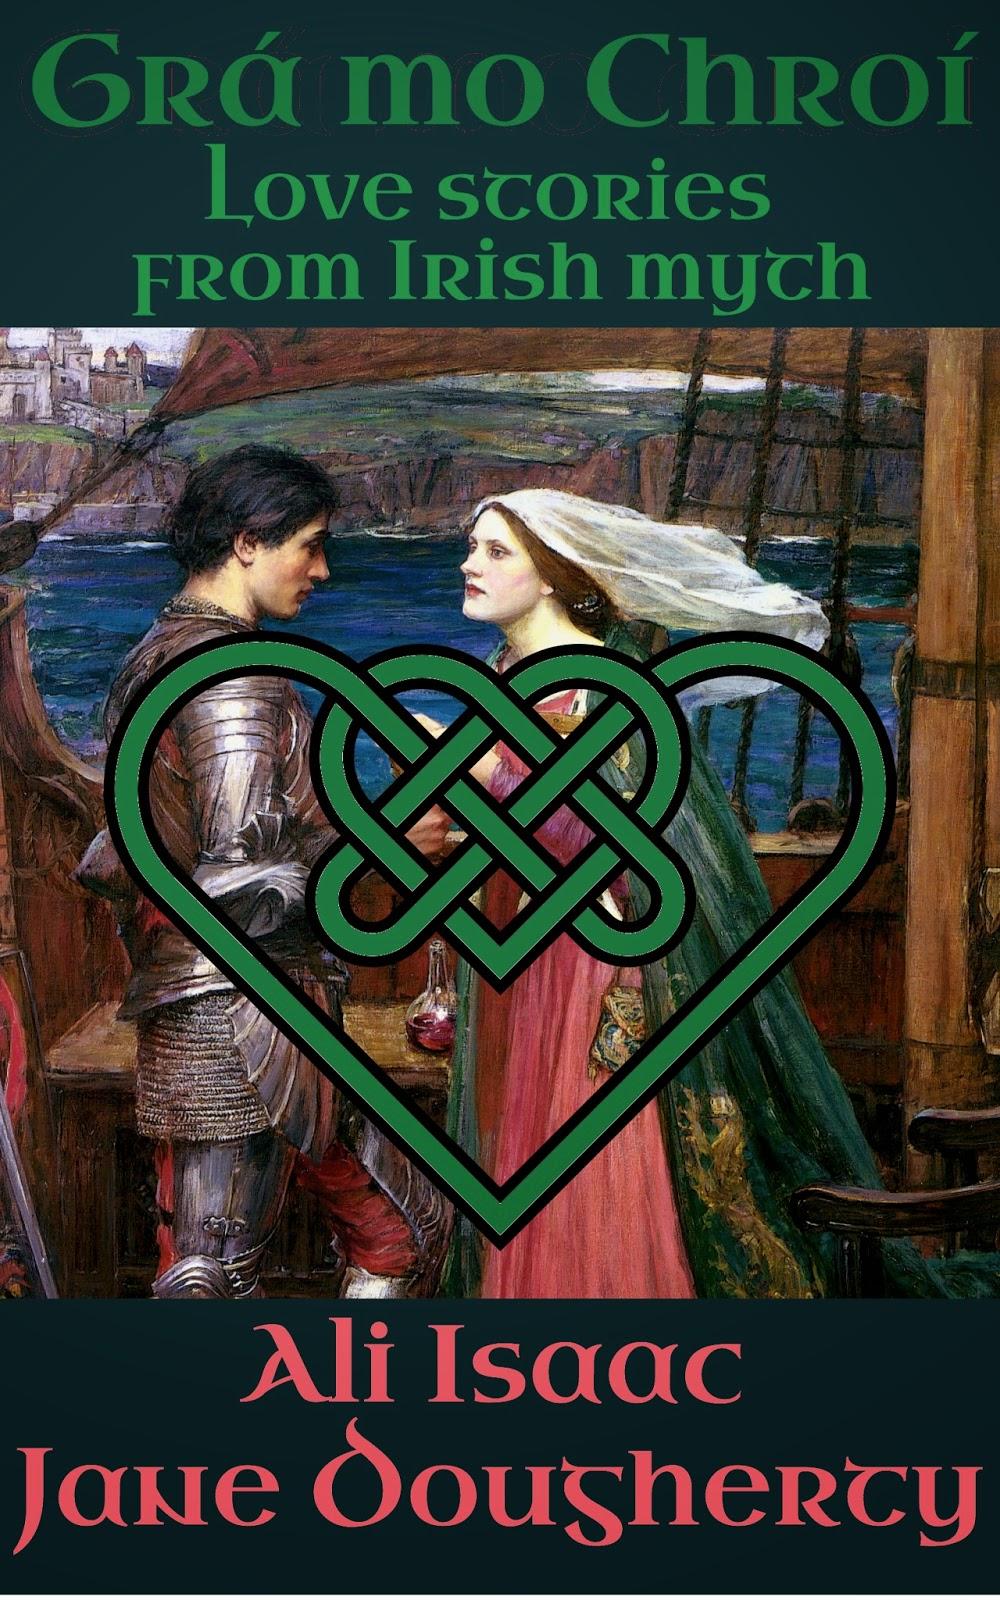 http://www.amazon.com/Gr%C3%A1-Chro%C3%AD-Love-Stories-Irish-ebook/dp/B00SQ2IUZQ/